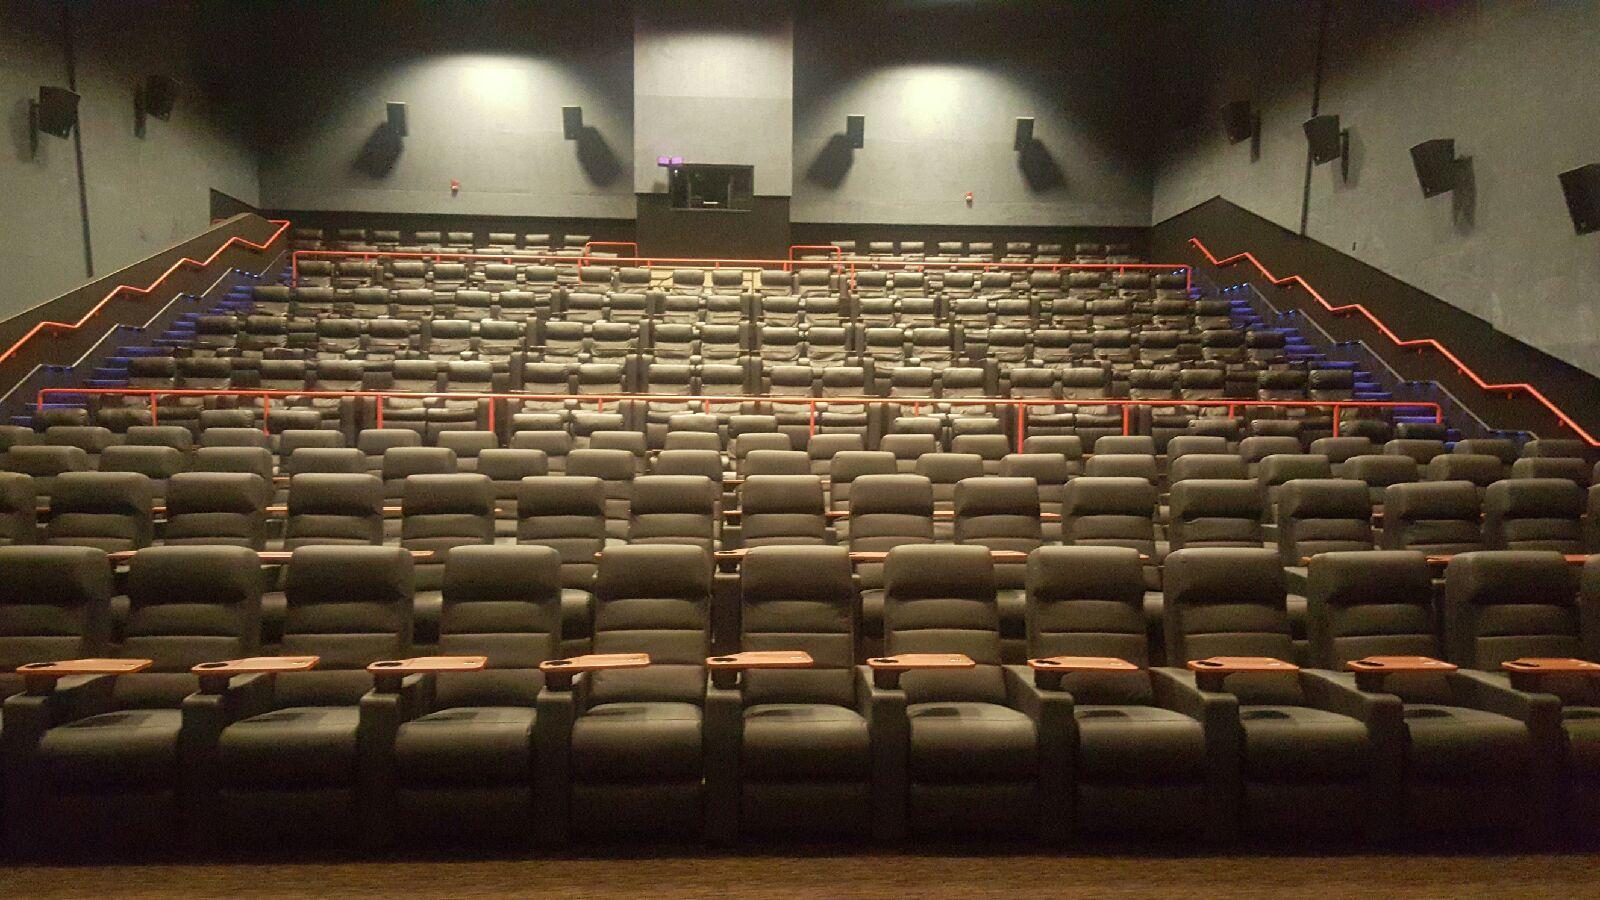 Inorca cinema seat installation